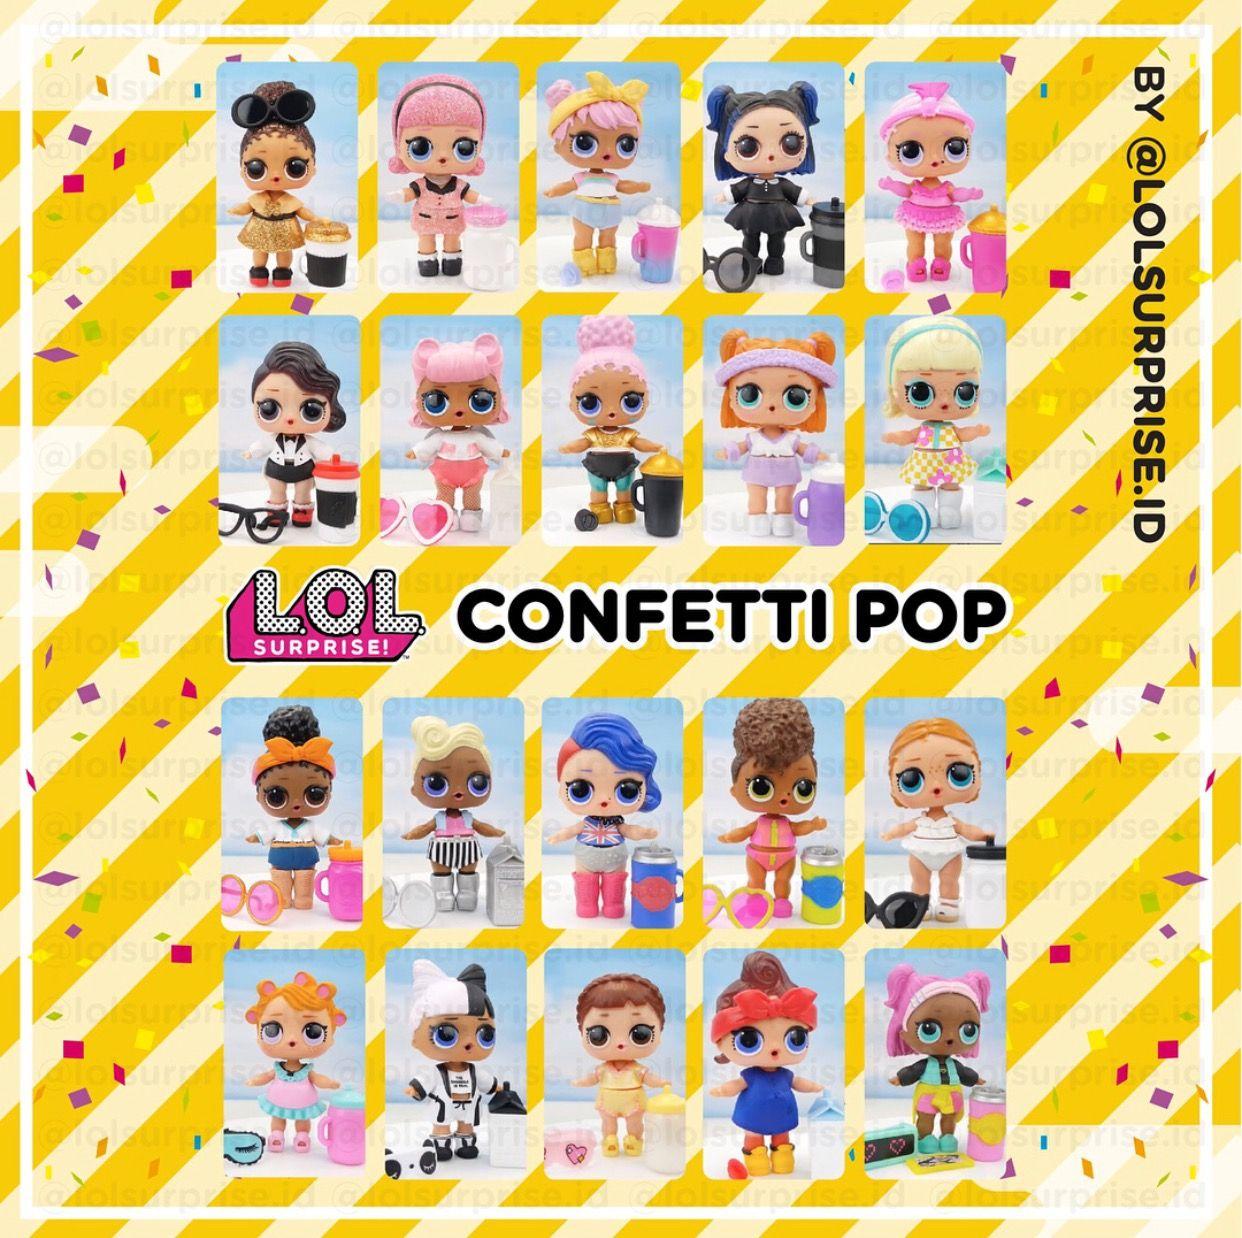 ❤️LOL Surprise Cheeky Babe Dolls Confetti Pop big sister collect